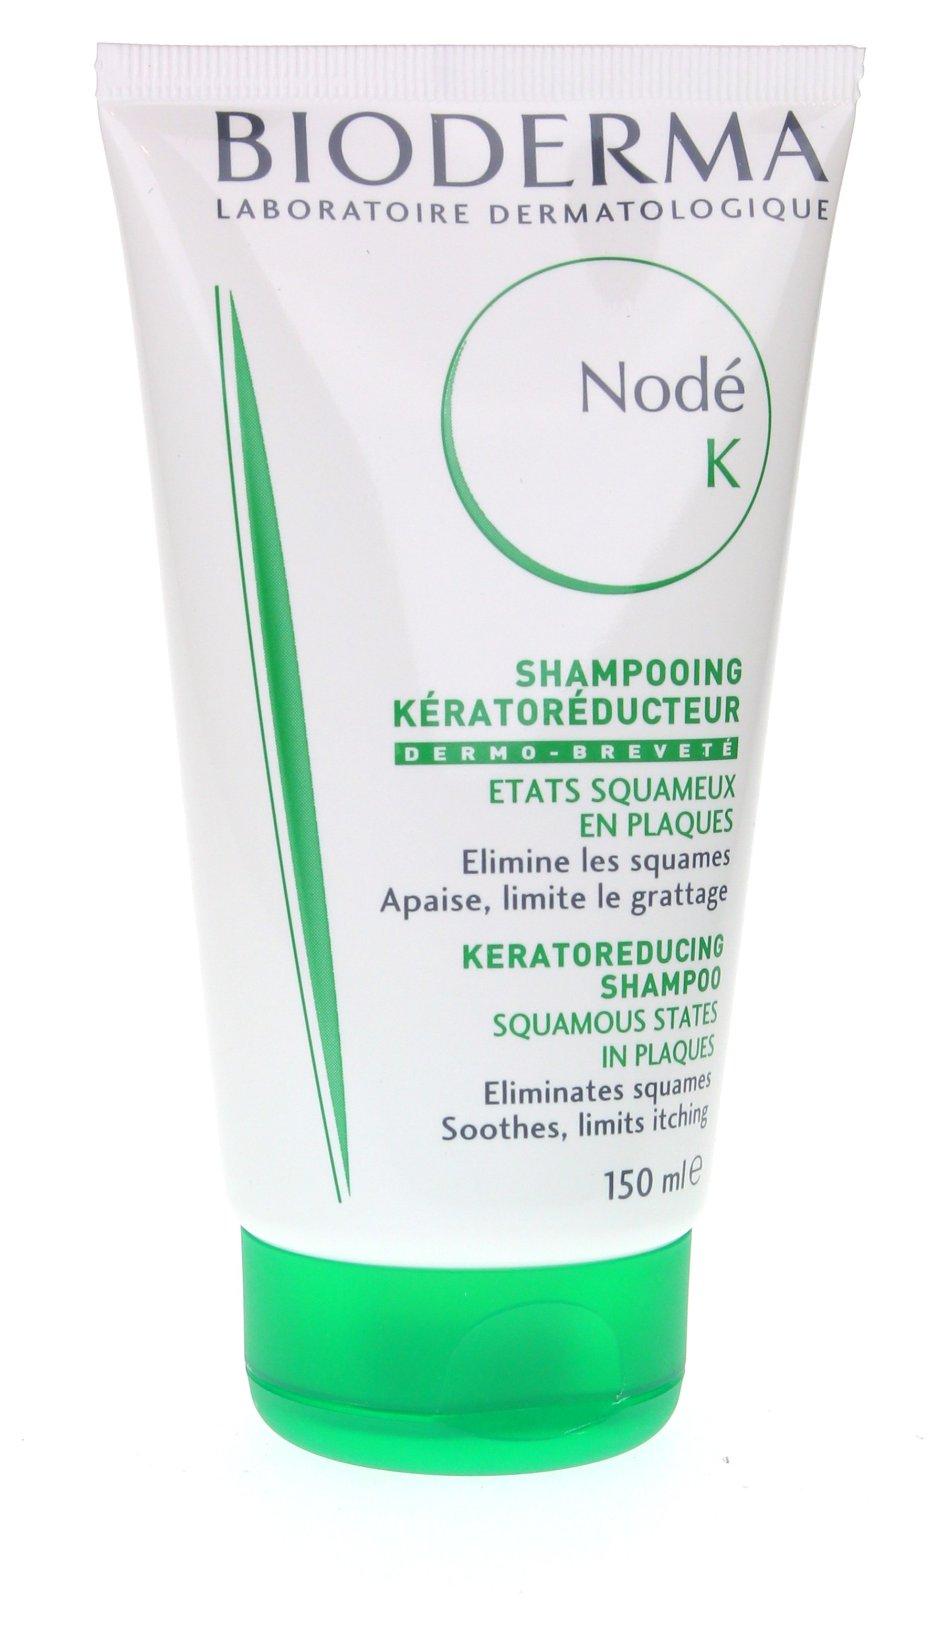 bioderma node k